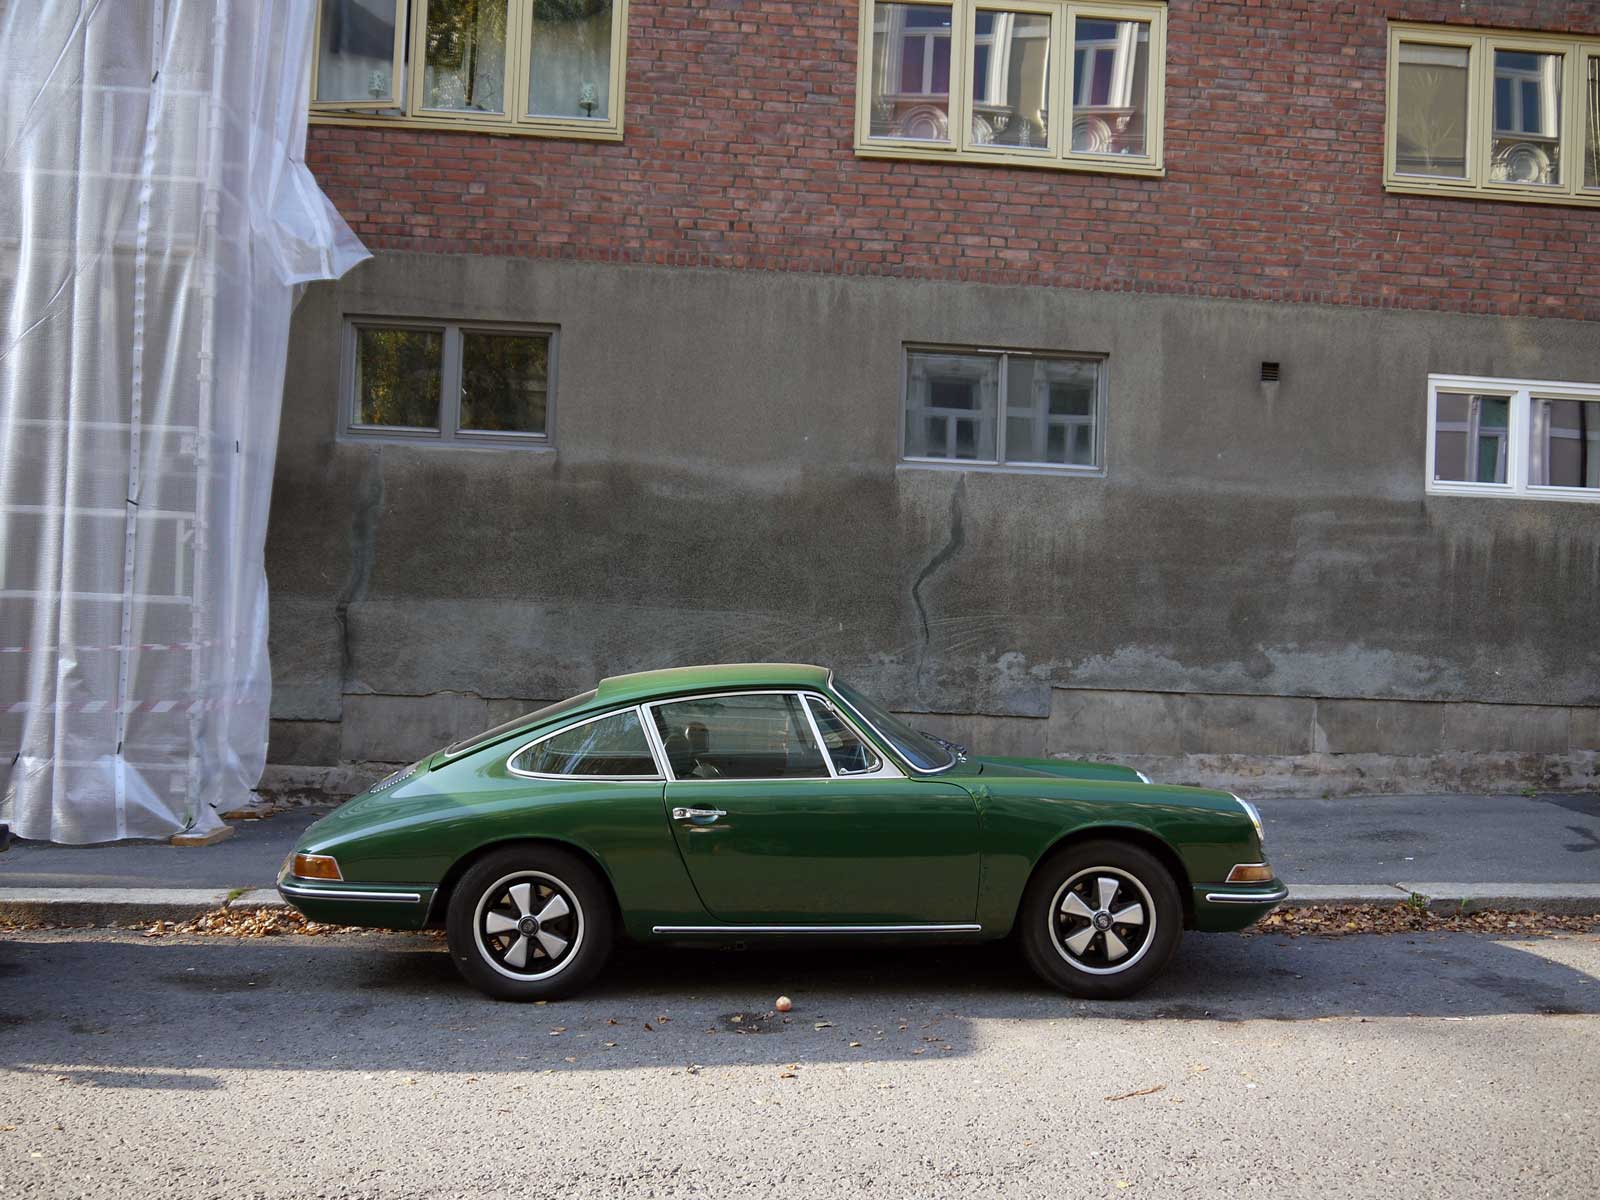 1966 Porshe 912 Coupe